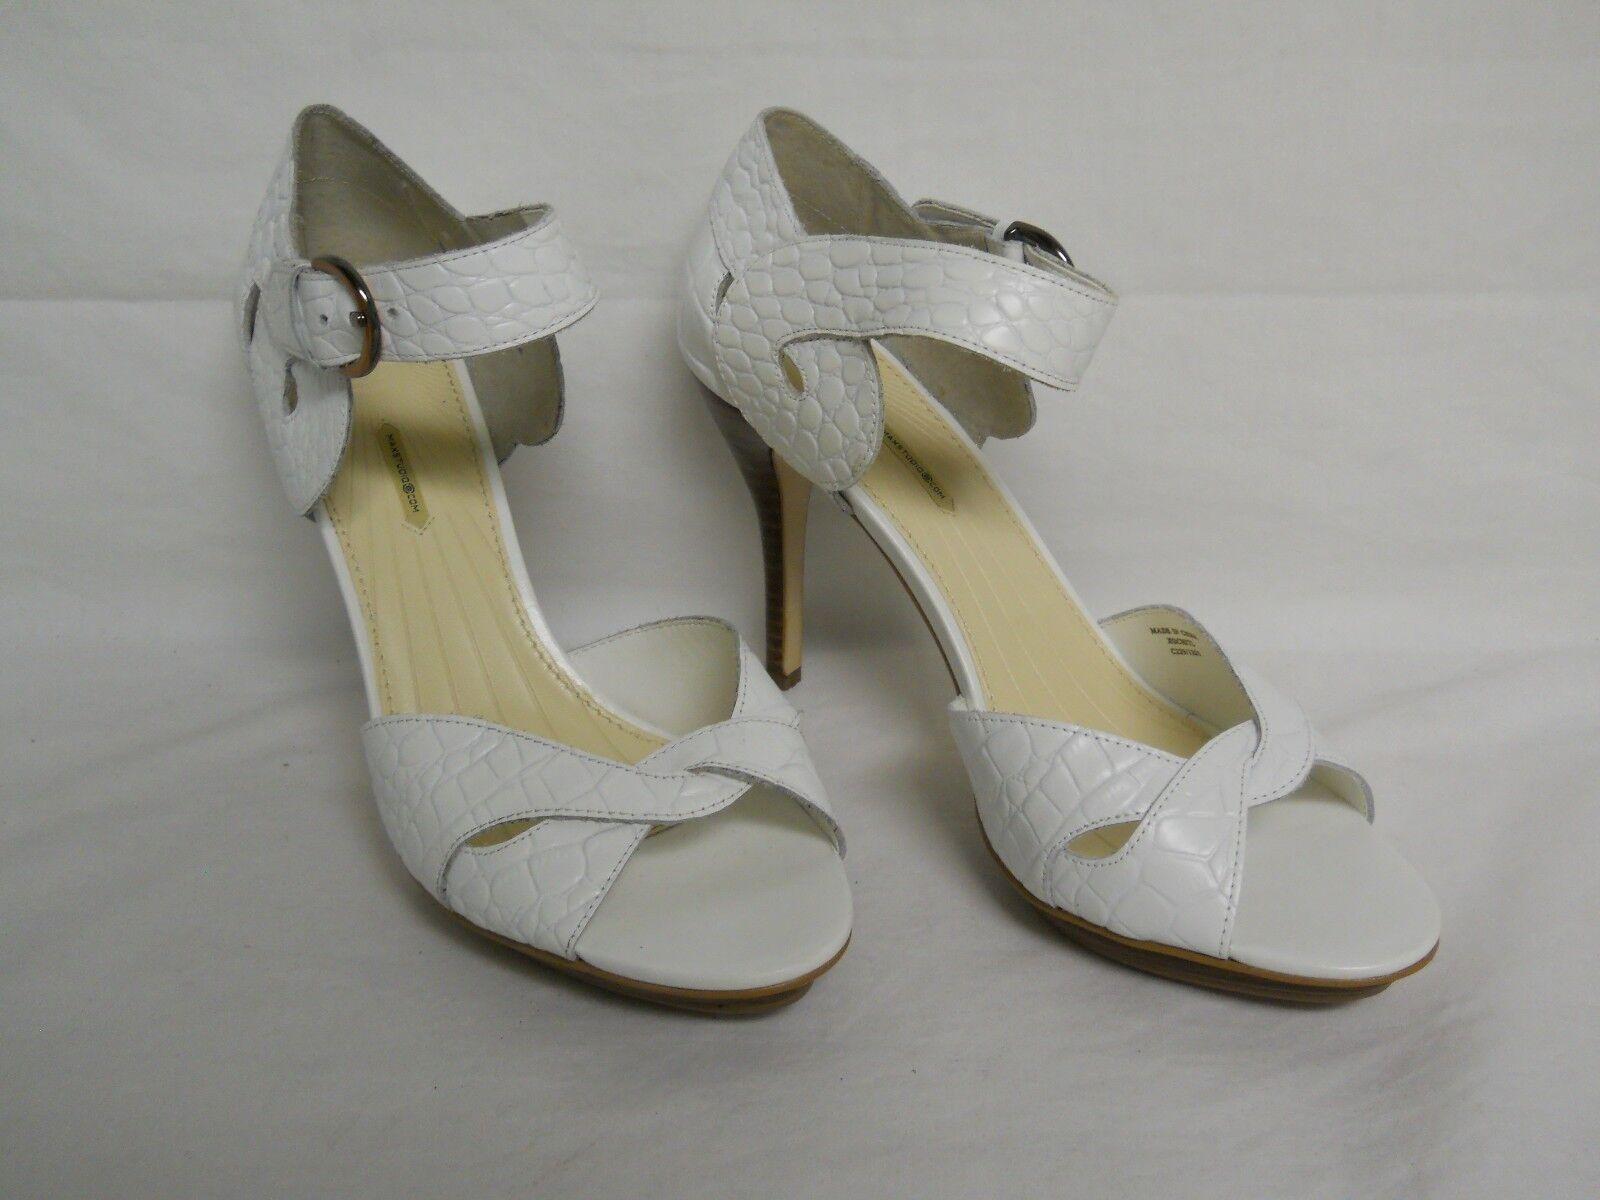 Max Studio NEU Damenschuhe Xochitl WEISS Leder Heels 9.5 M Schuhes NWOB